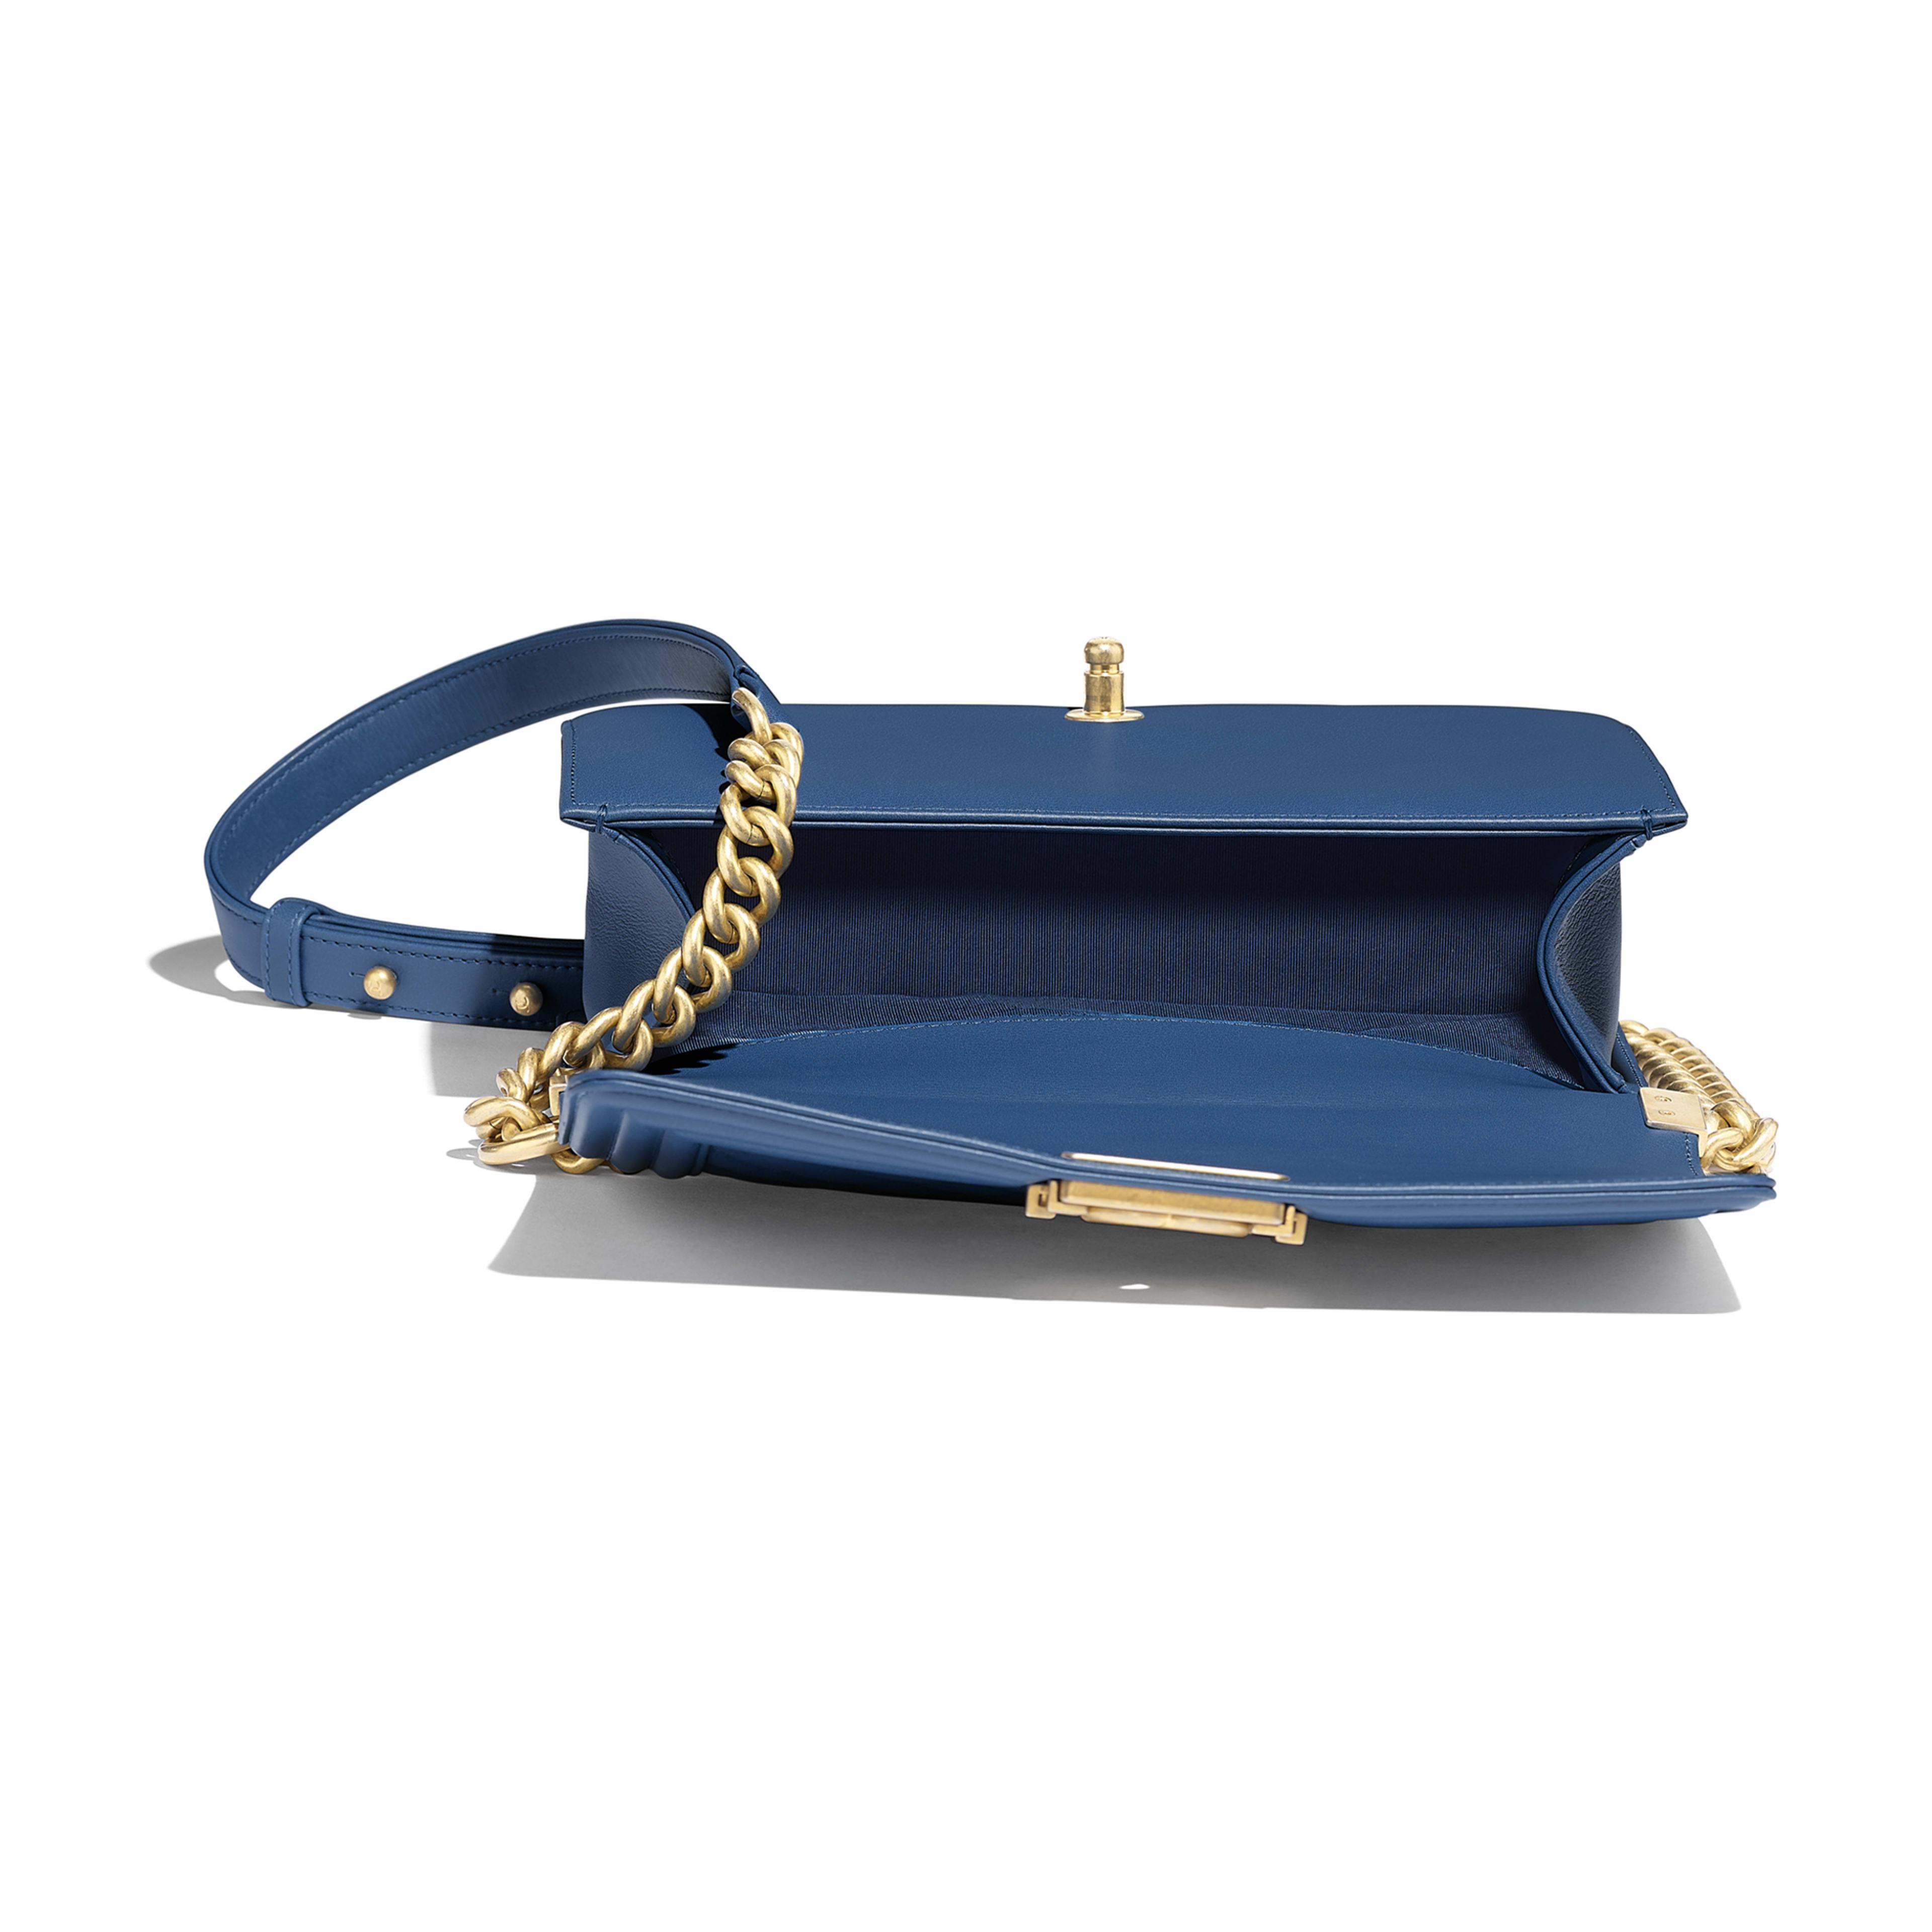 BOY CHANEL Handbag - Dark Blue - Calfskin & Gold-Tone Metal - Other view - see full sized version